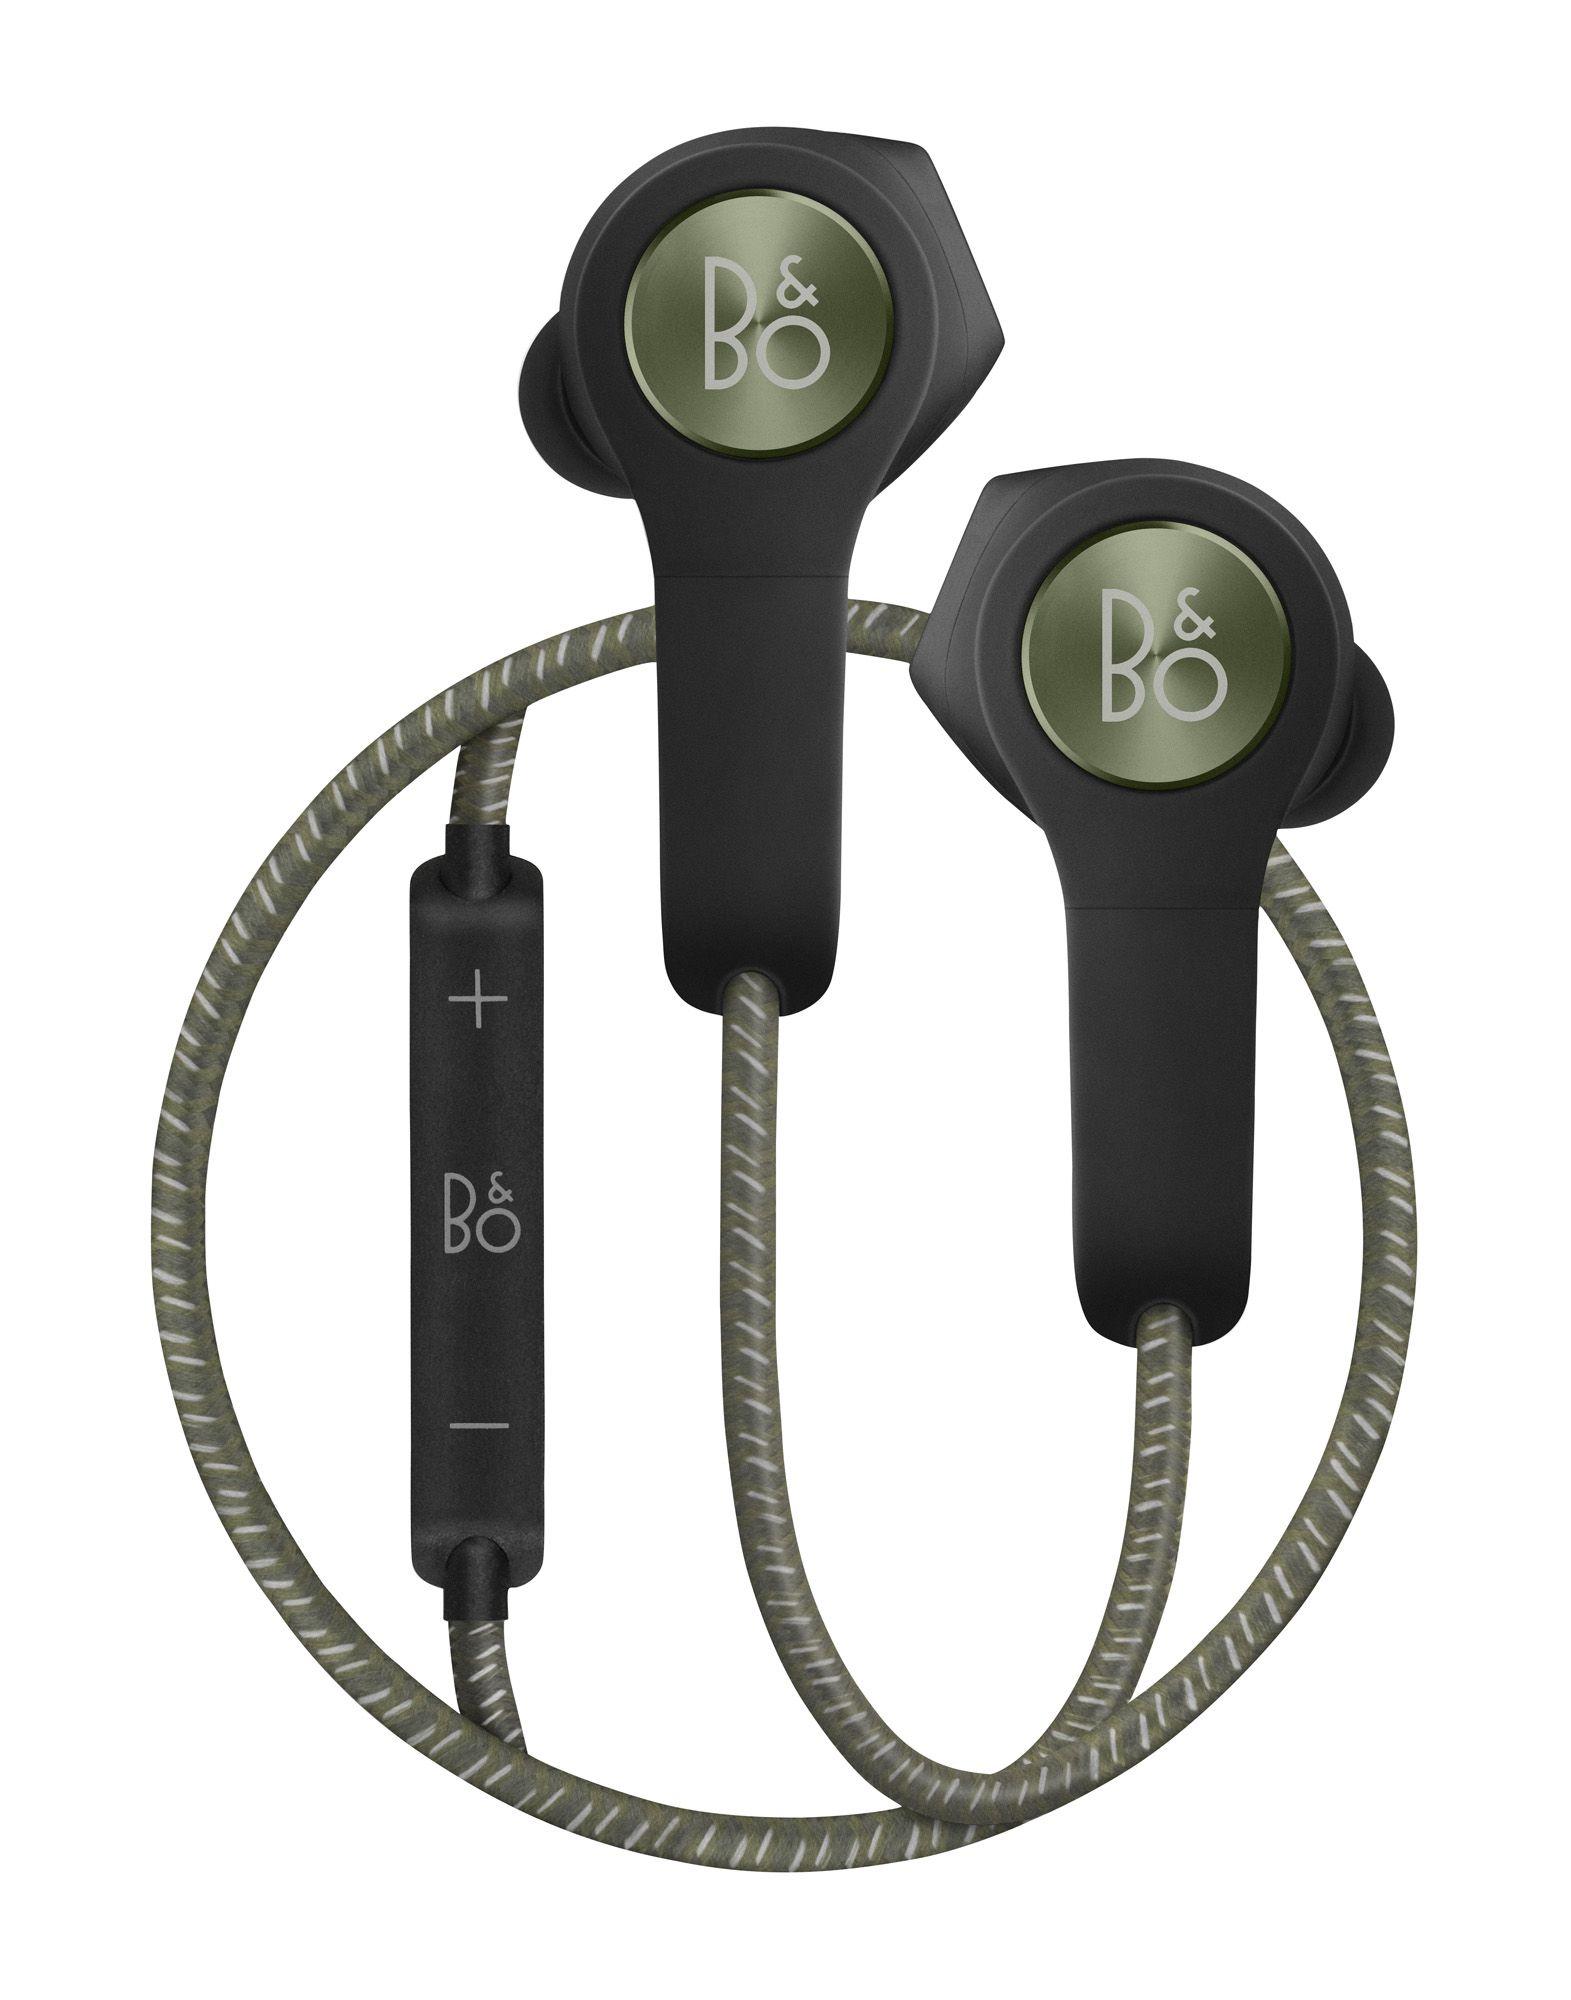 B&O PLAY Unisex Kopfhörer Farbe Grün Größe 1 jetztbilligerkaufen